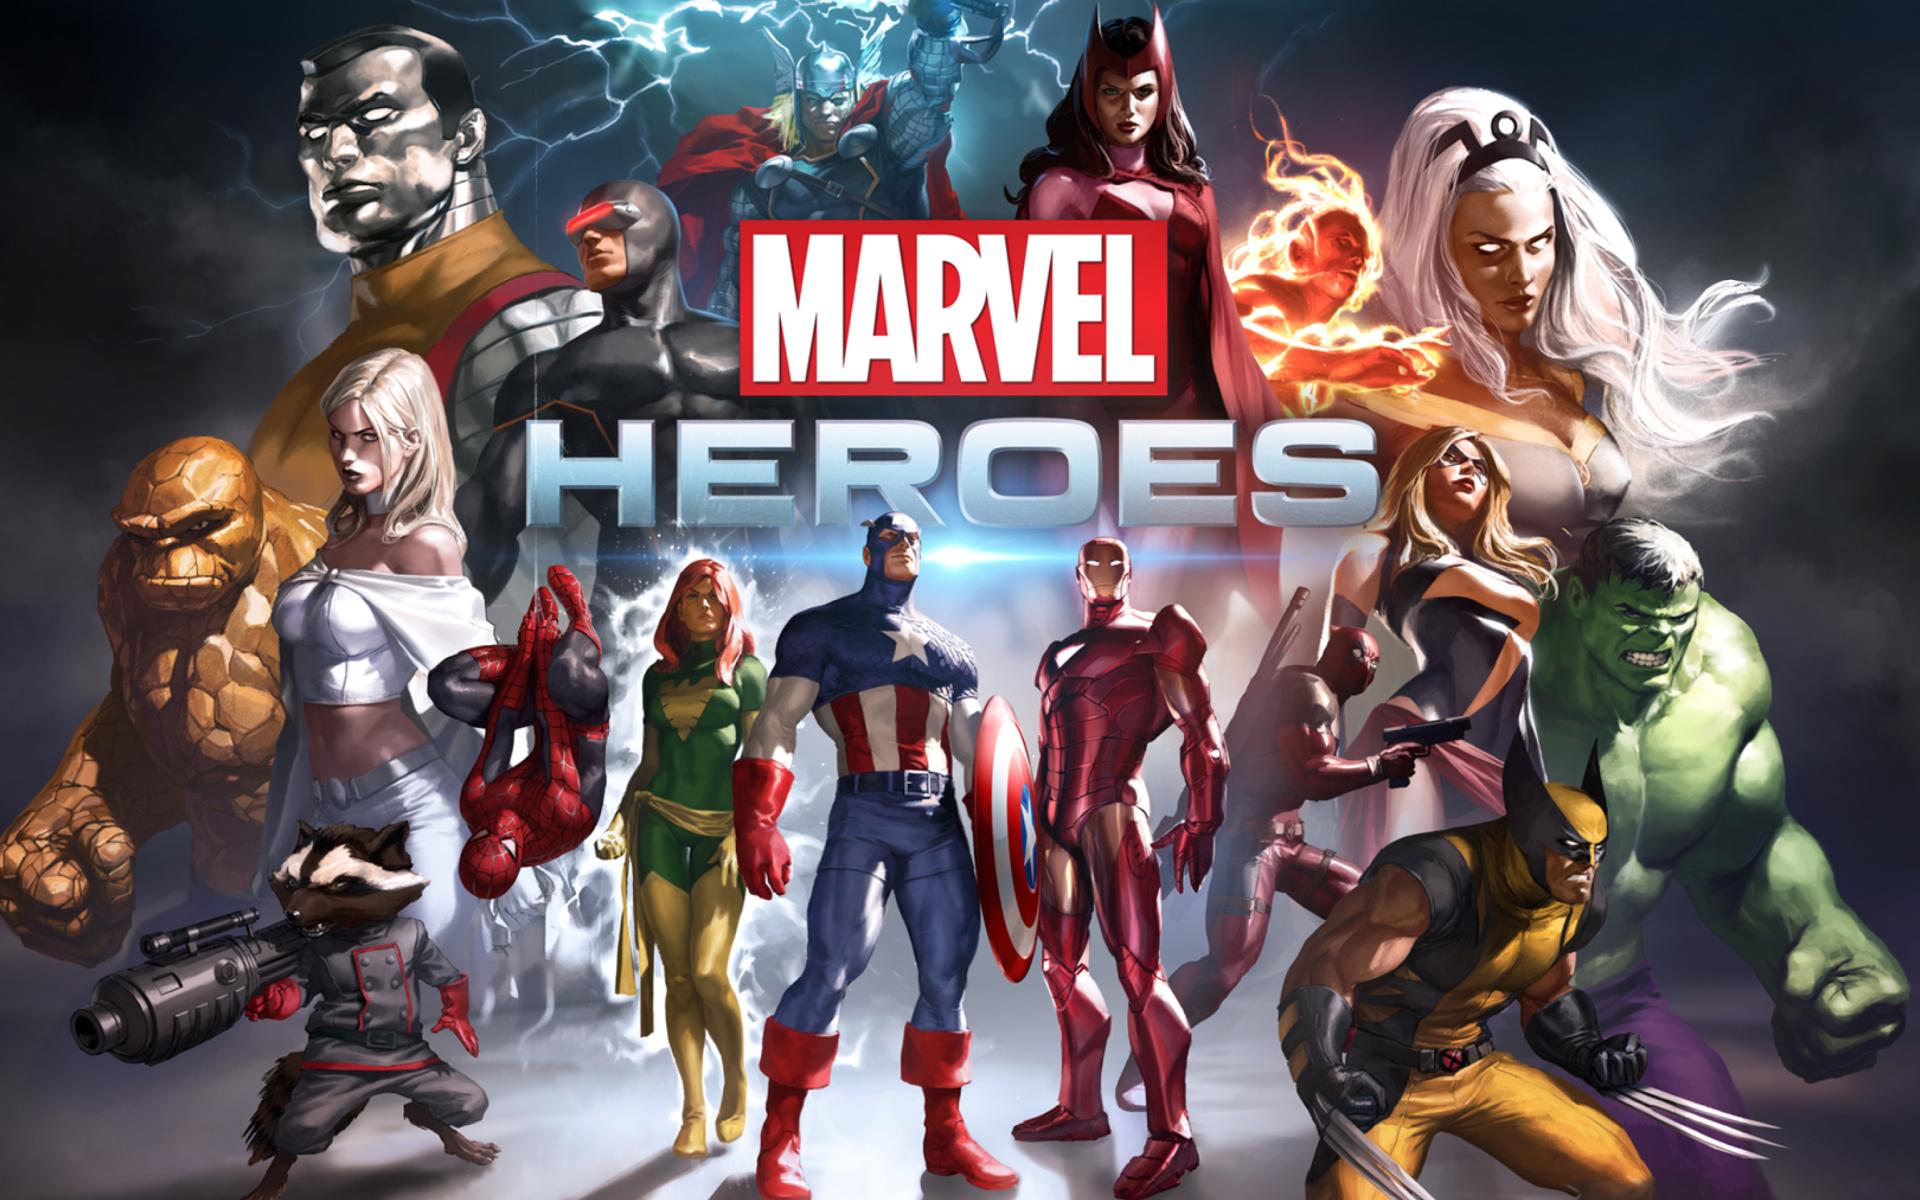 Descargar Fondos de Pantalla de Marvel Comics Fondo de Pantalla Marvel